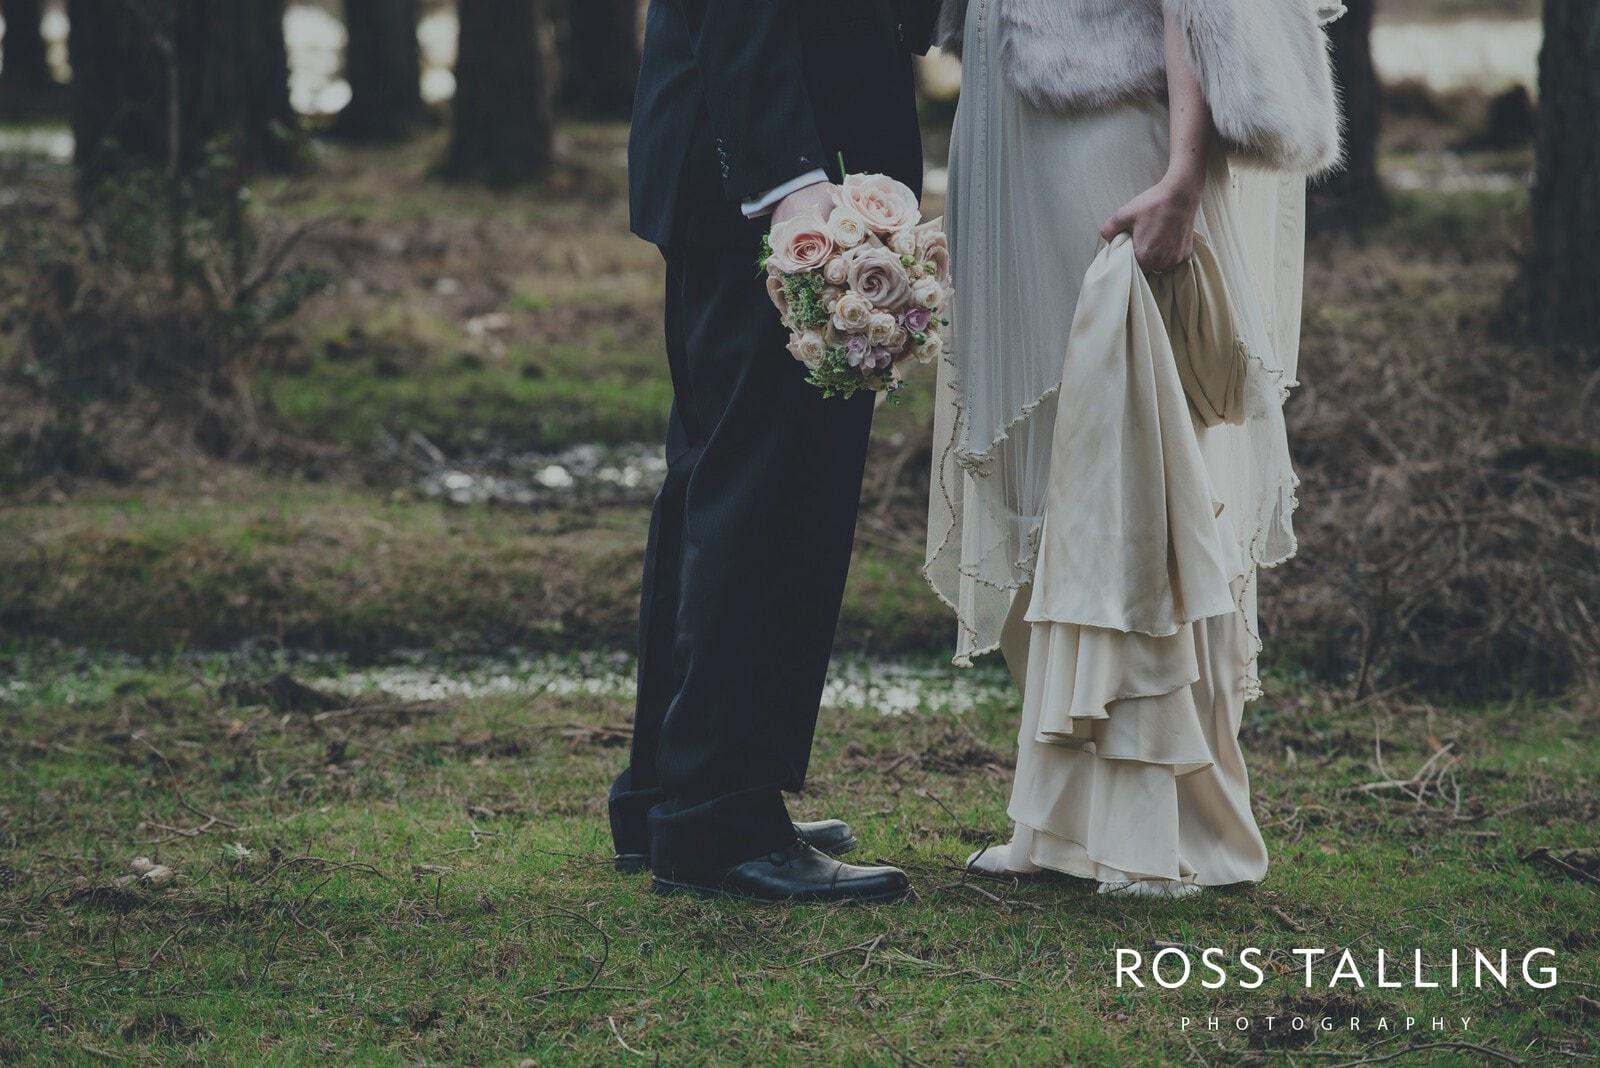 Louise & Matt | Hampshire Wedding Photography